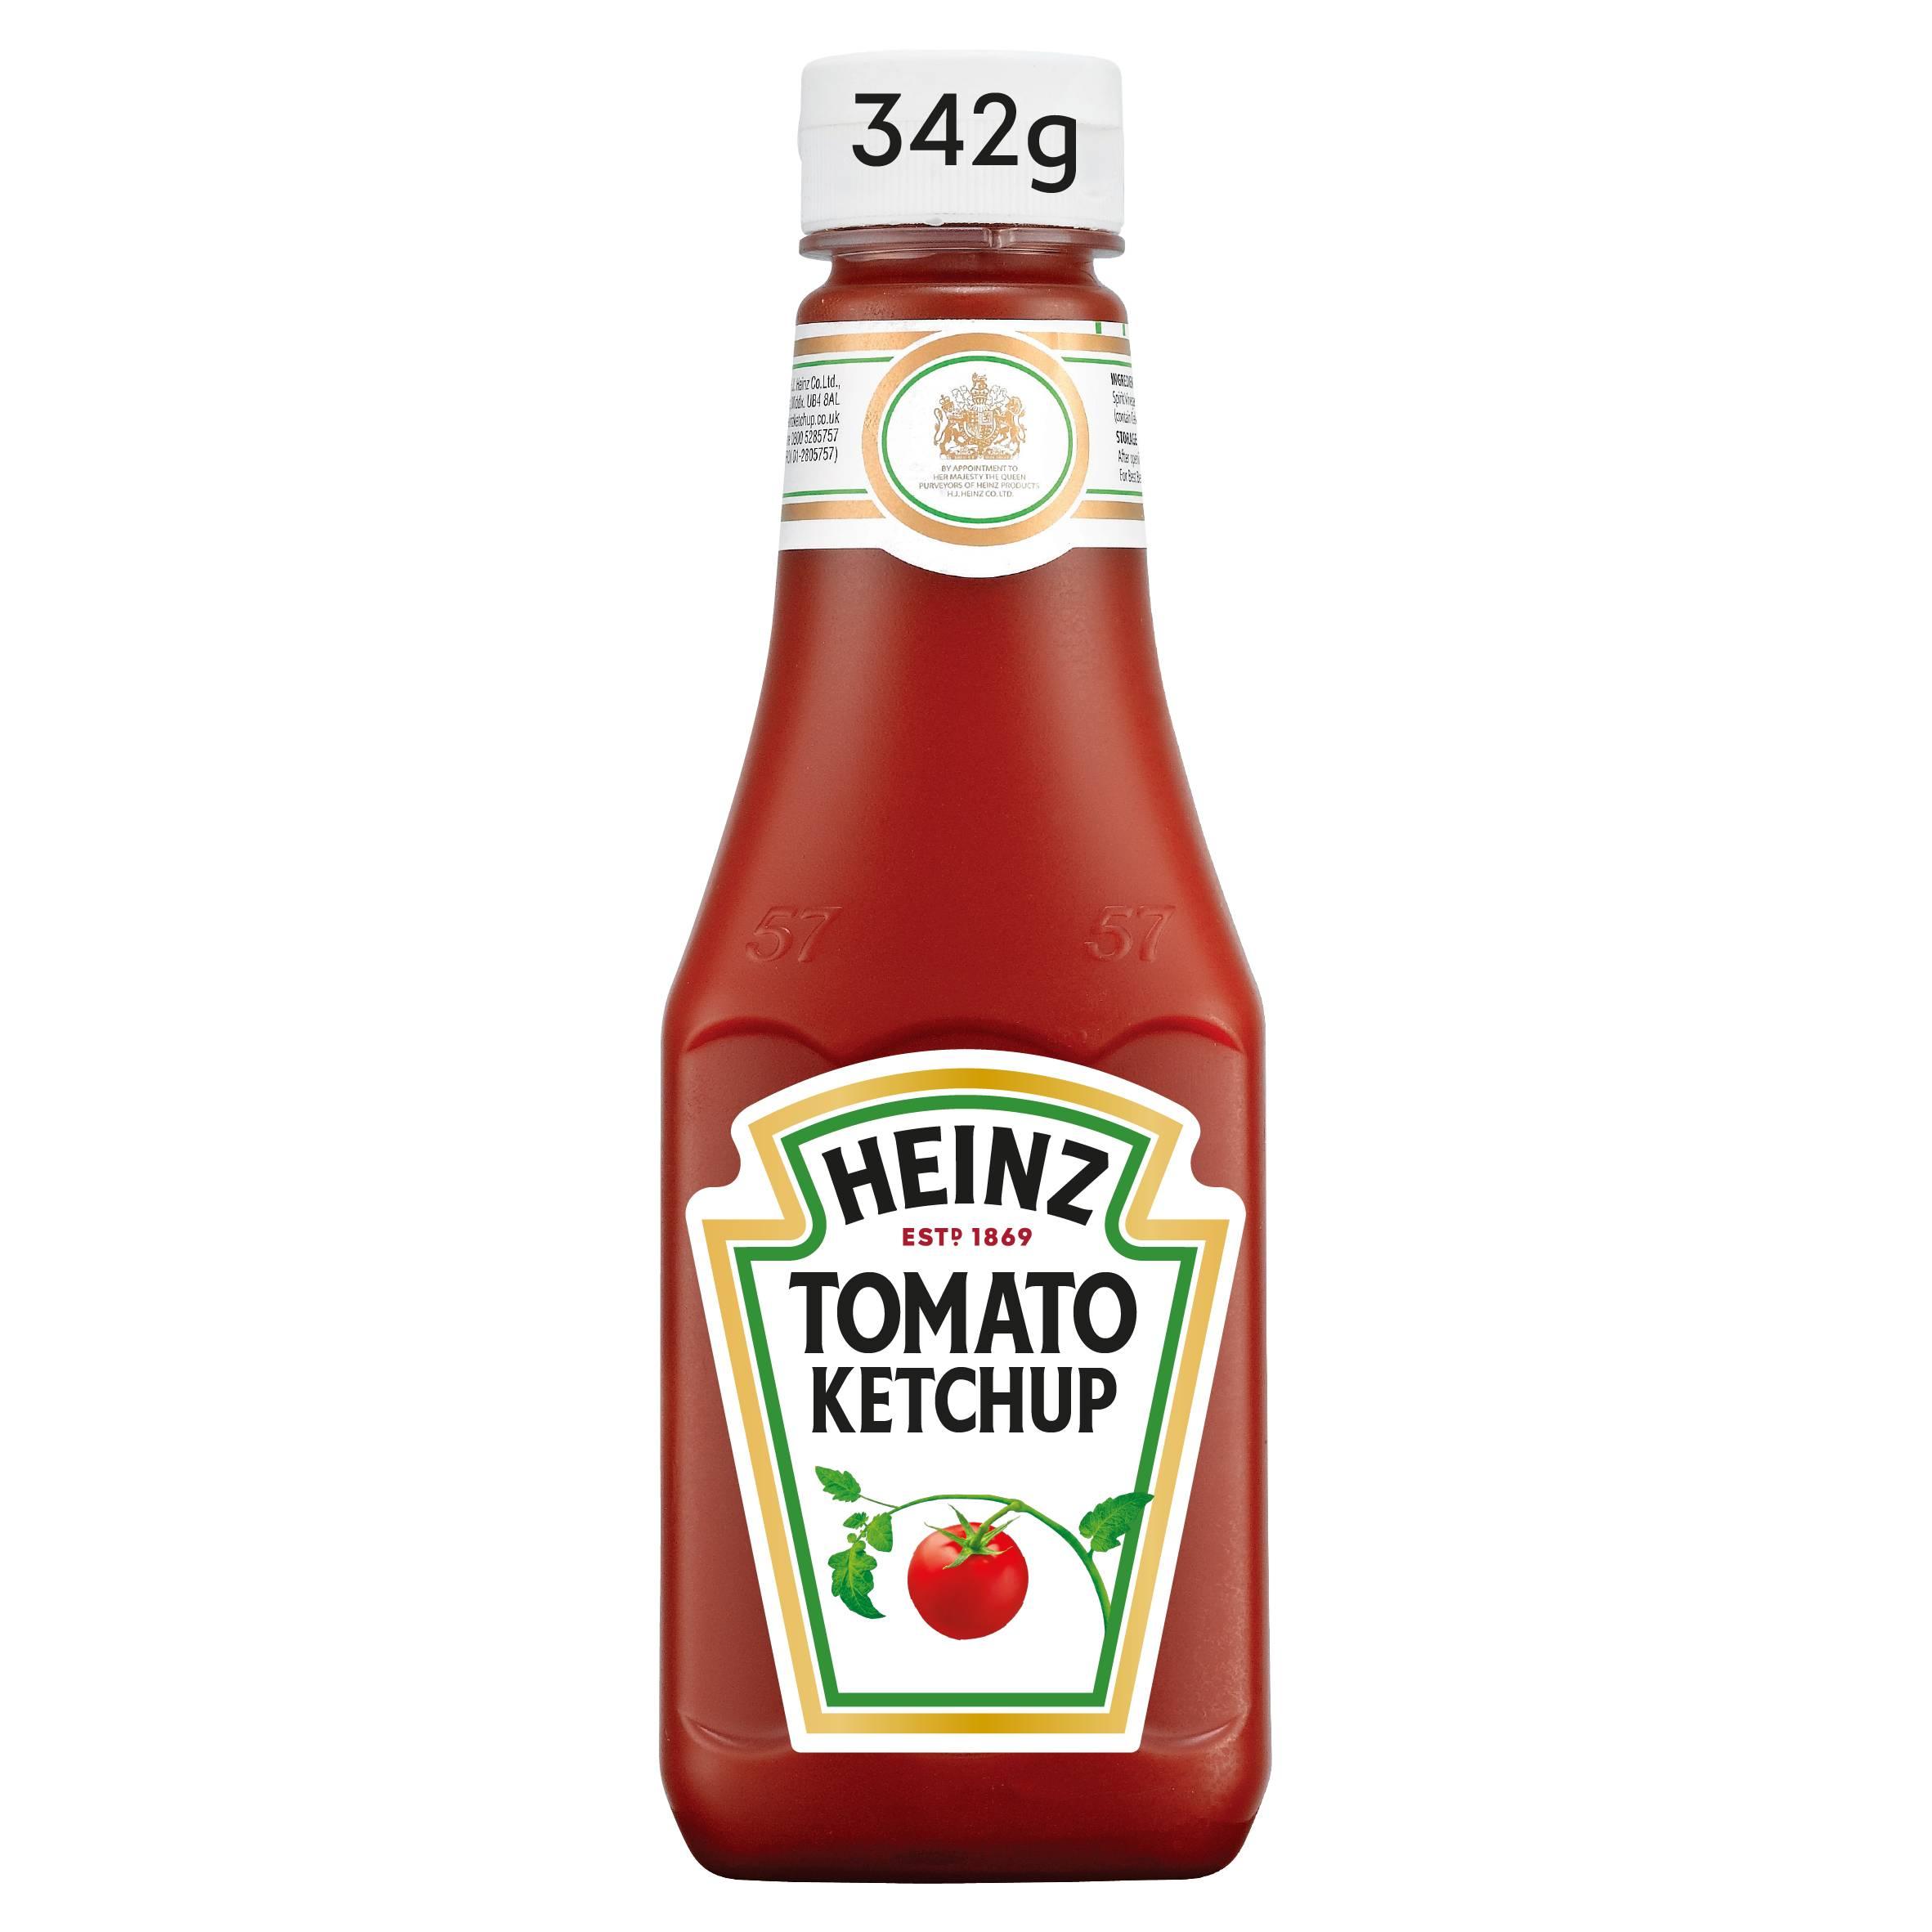 Heinz Tomato Ketchup 300ml Flacon Souple Top Up image